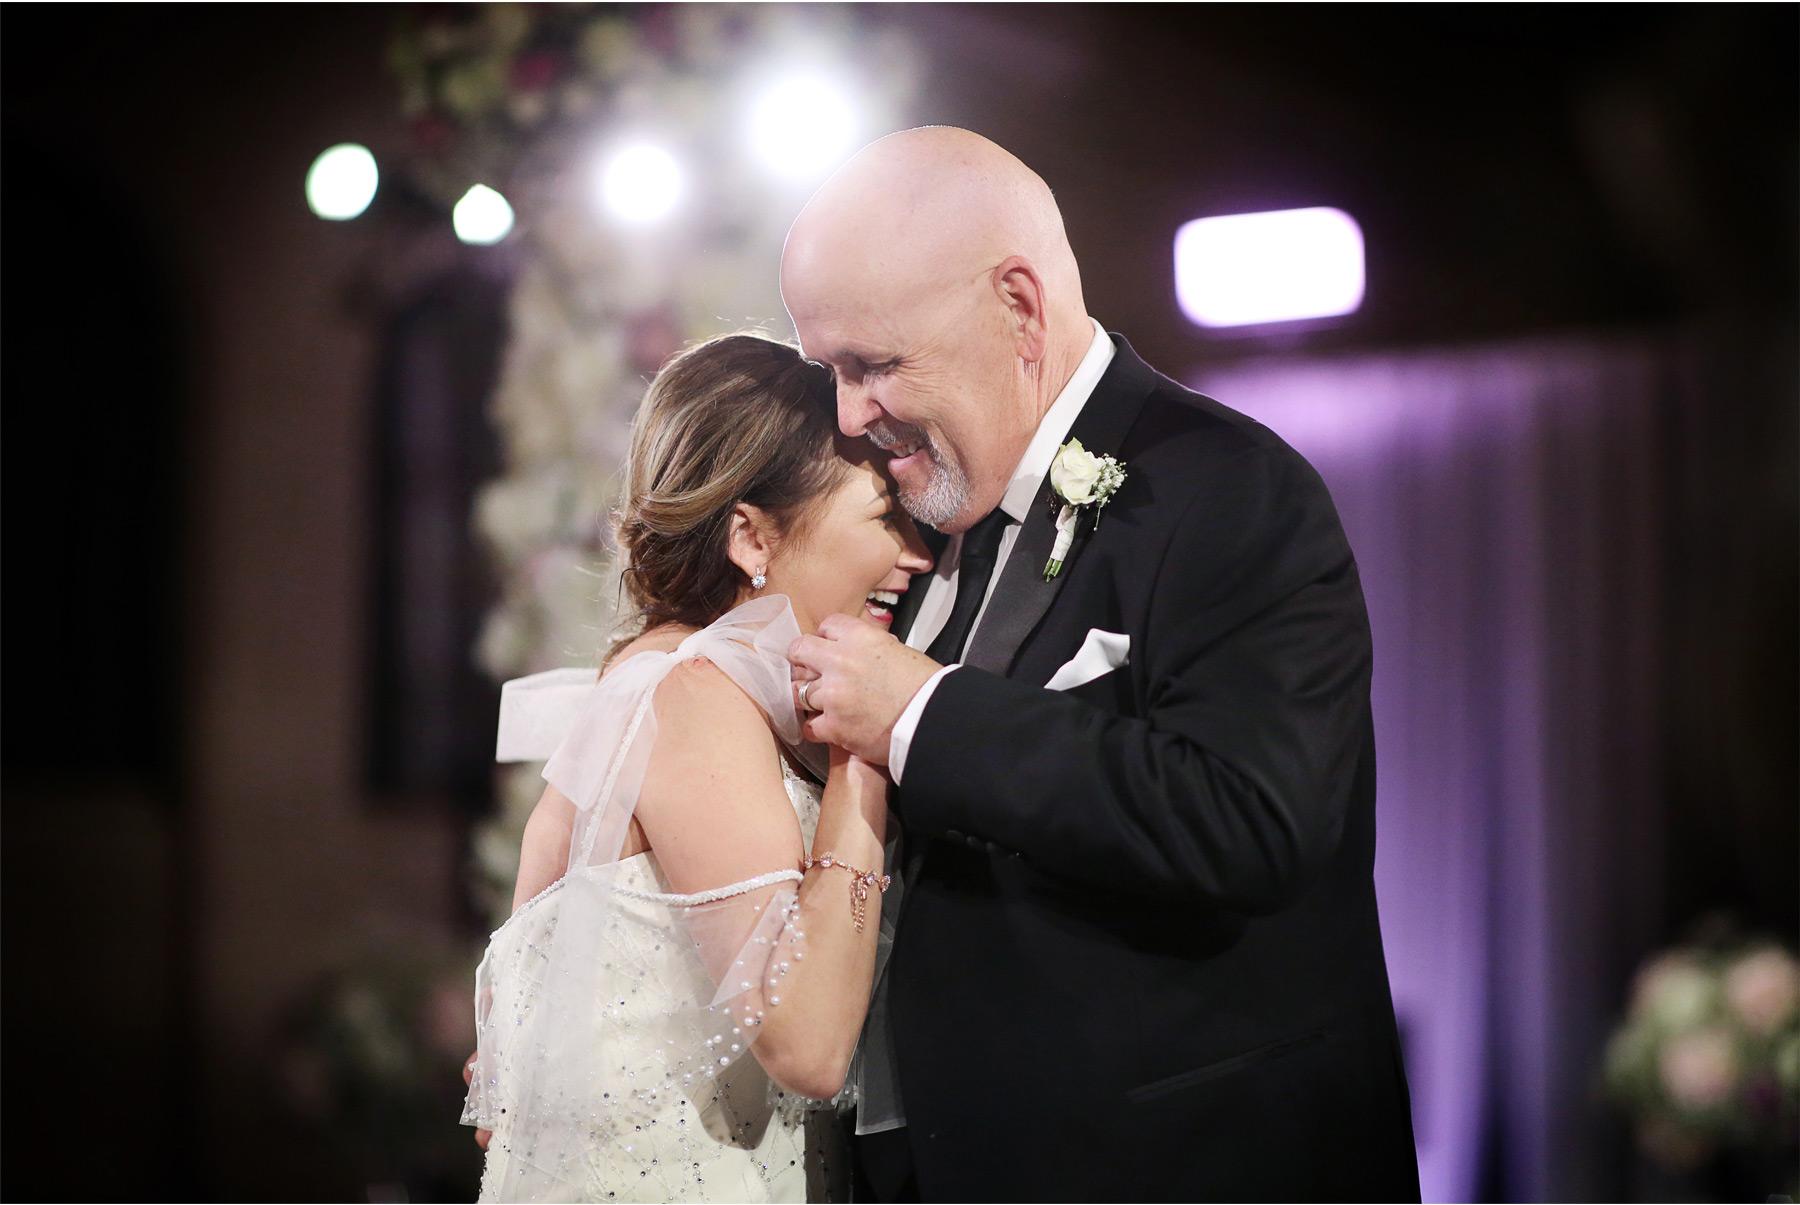 18-Saint-Paul-Minnesota-Wedding-by-Vick-Photography-Union-Depot-Lifetime-Network-David-Tutera-My-Great-Big-Live-Wedding-Father-Daughter-Dance-Reception-Jen-and-Rob.jpg